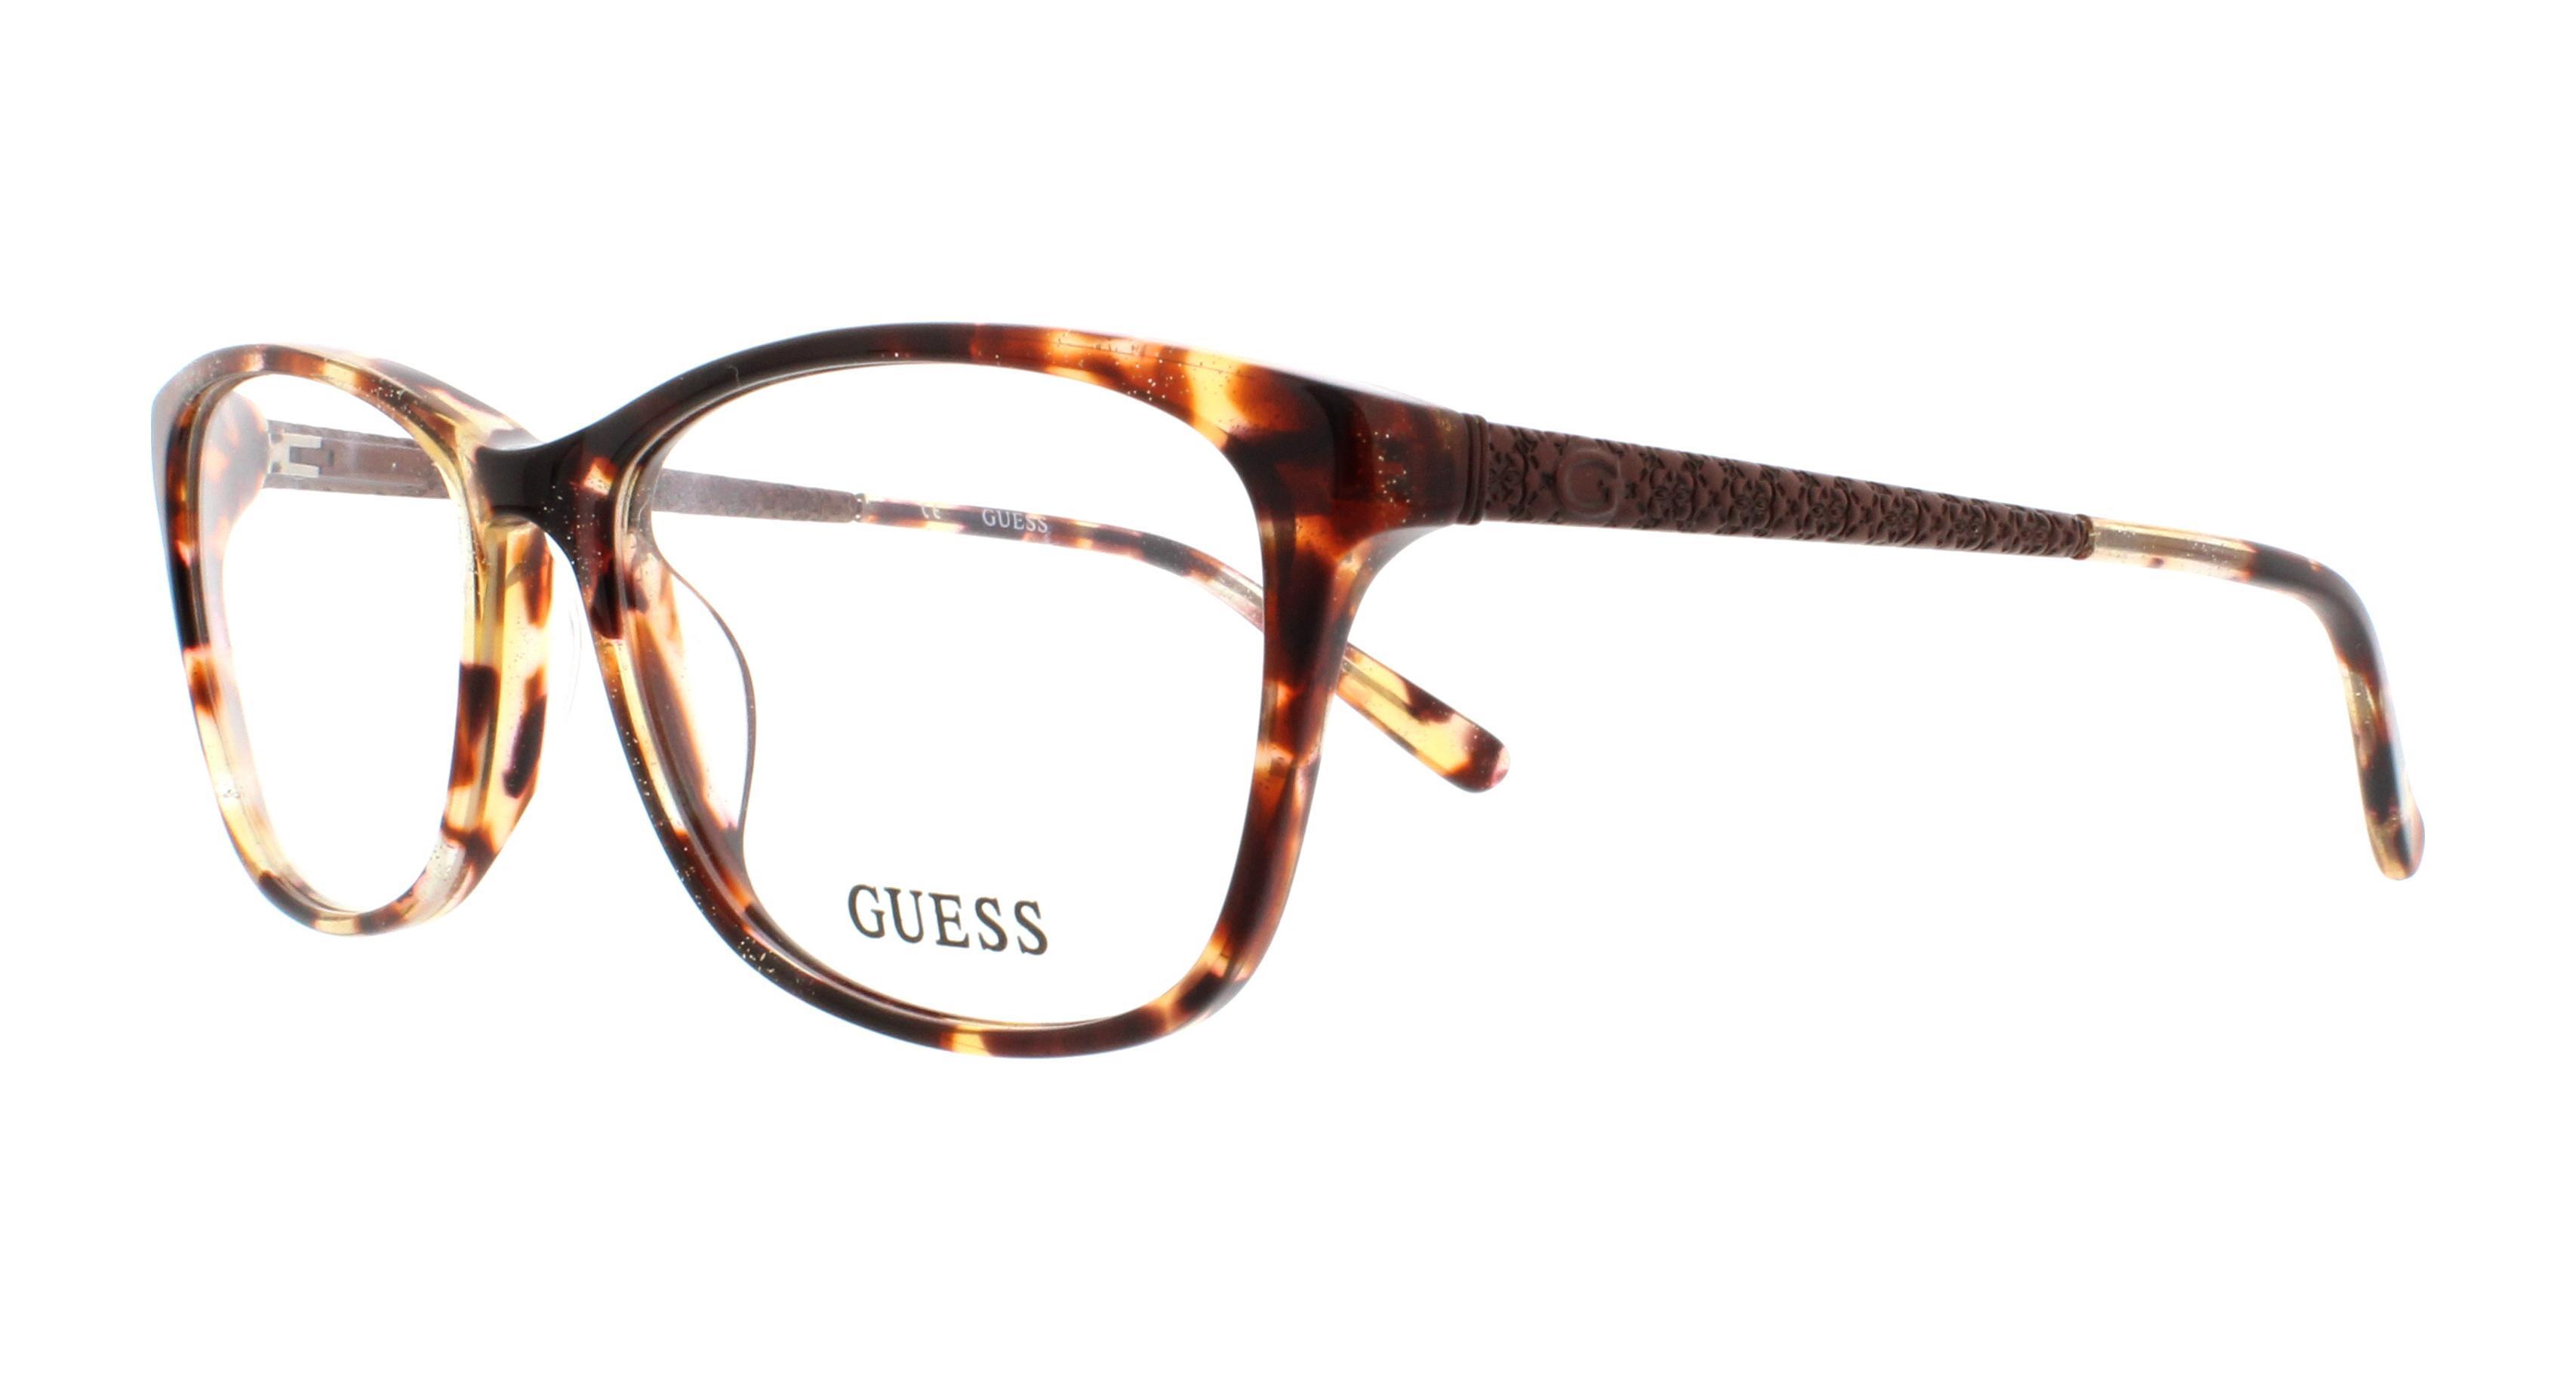 GUESS Eyeglasses GU2500 047 Light Brown 53MM 664689697489   eBay